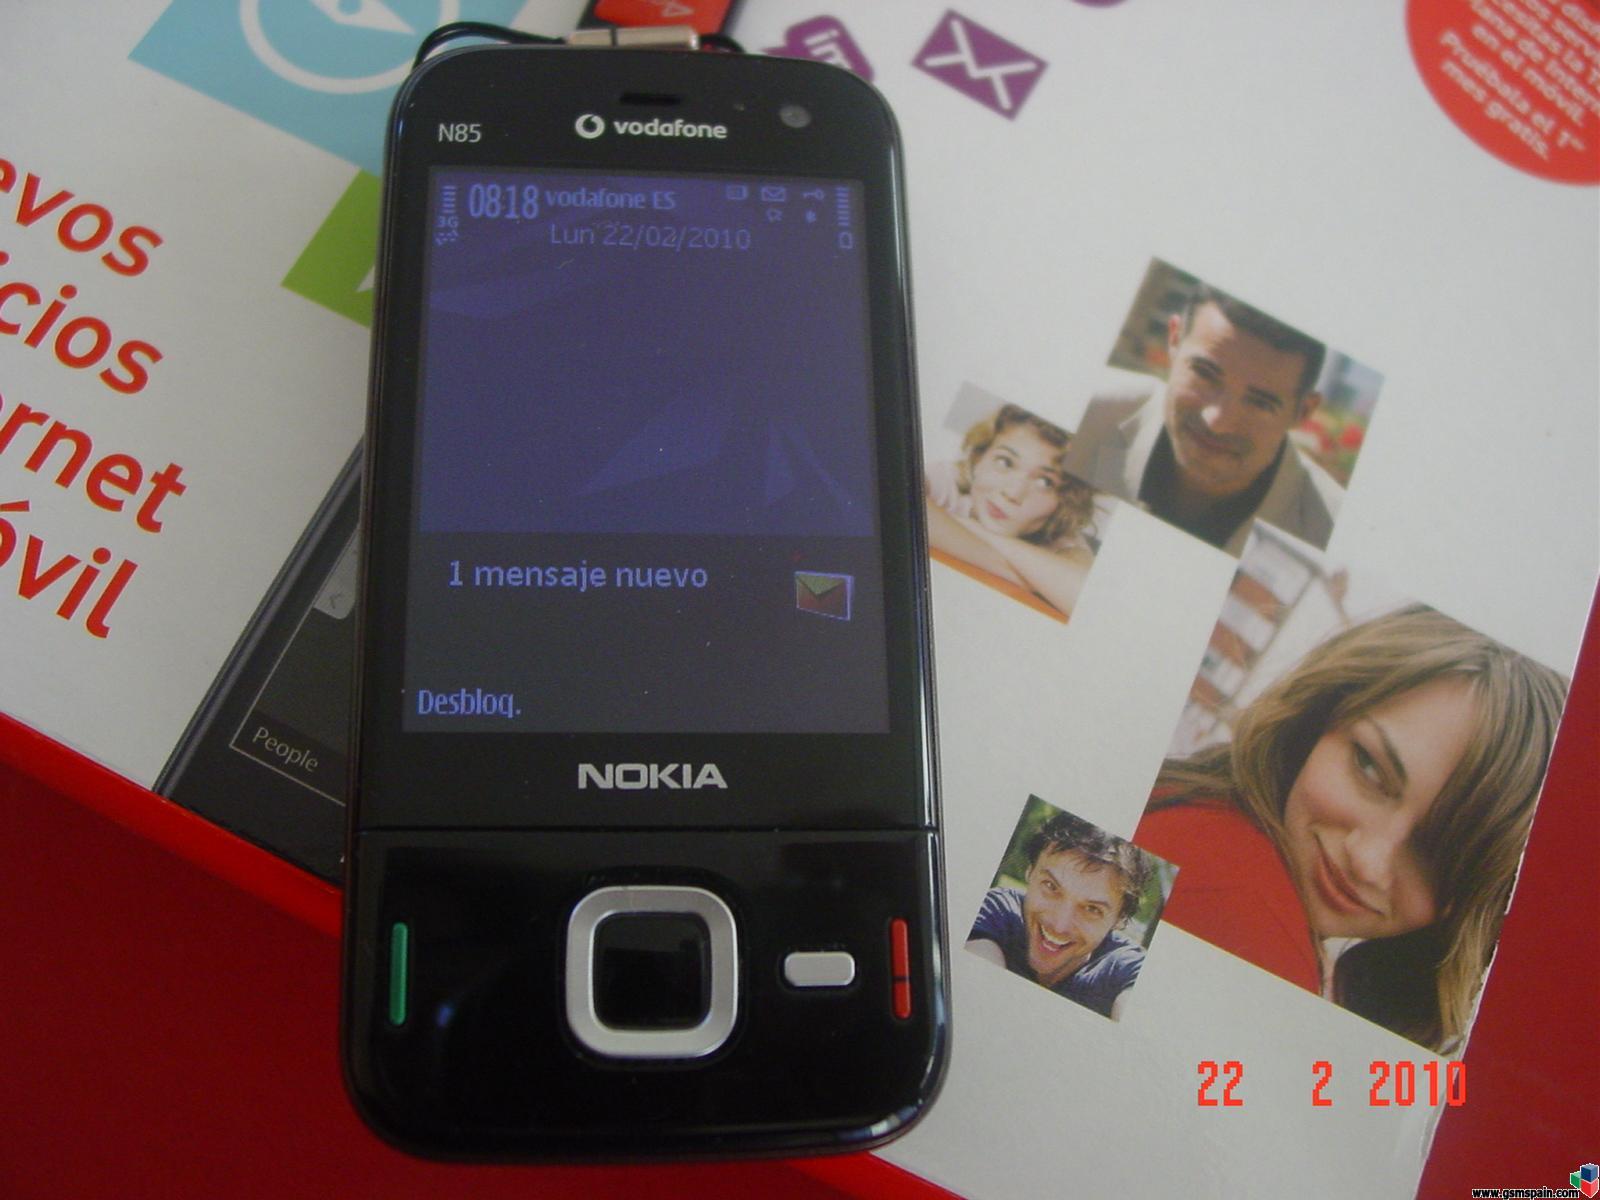 Vendo Nokia N85 Vodafone